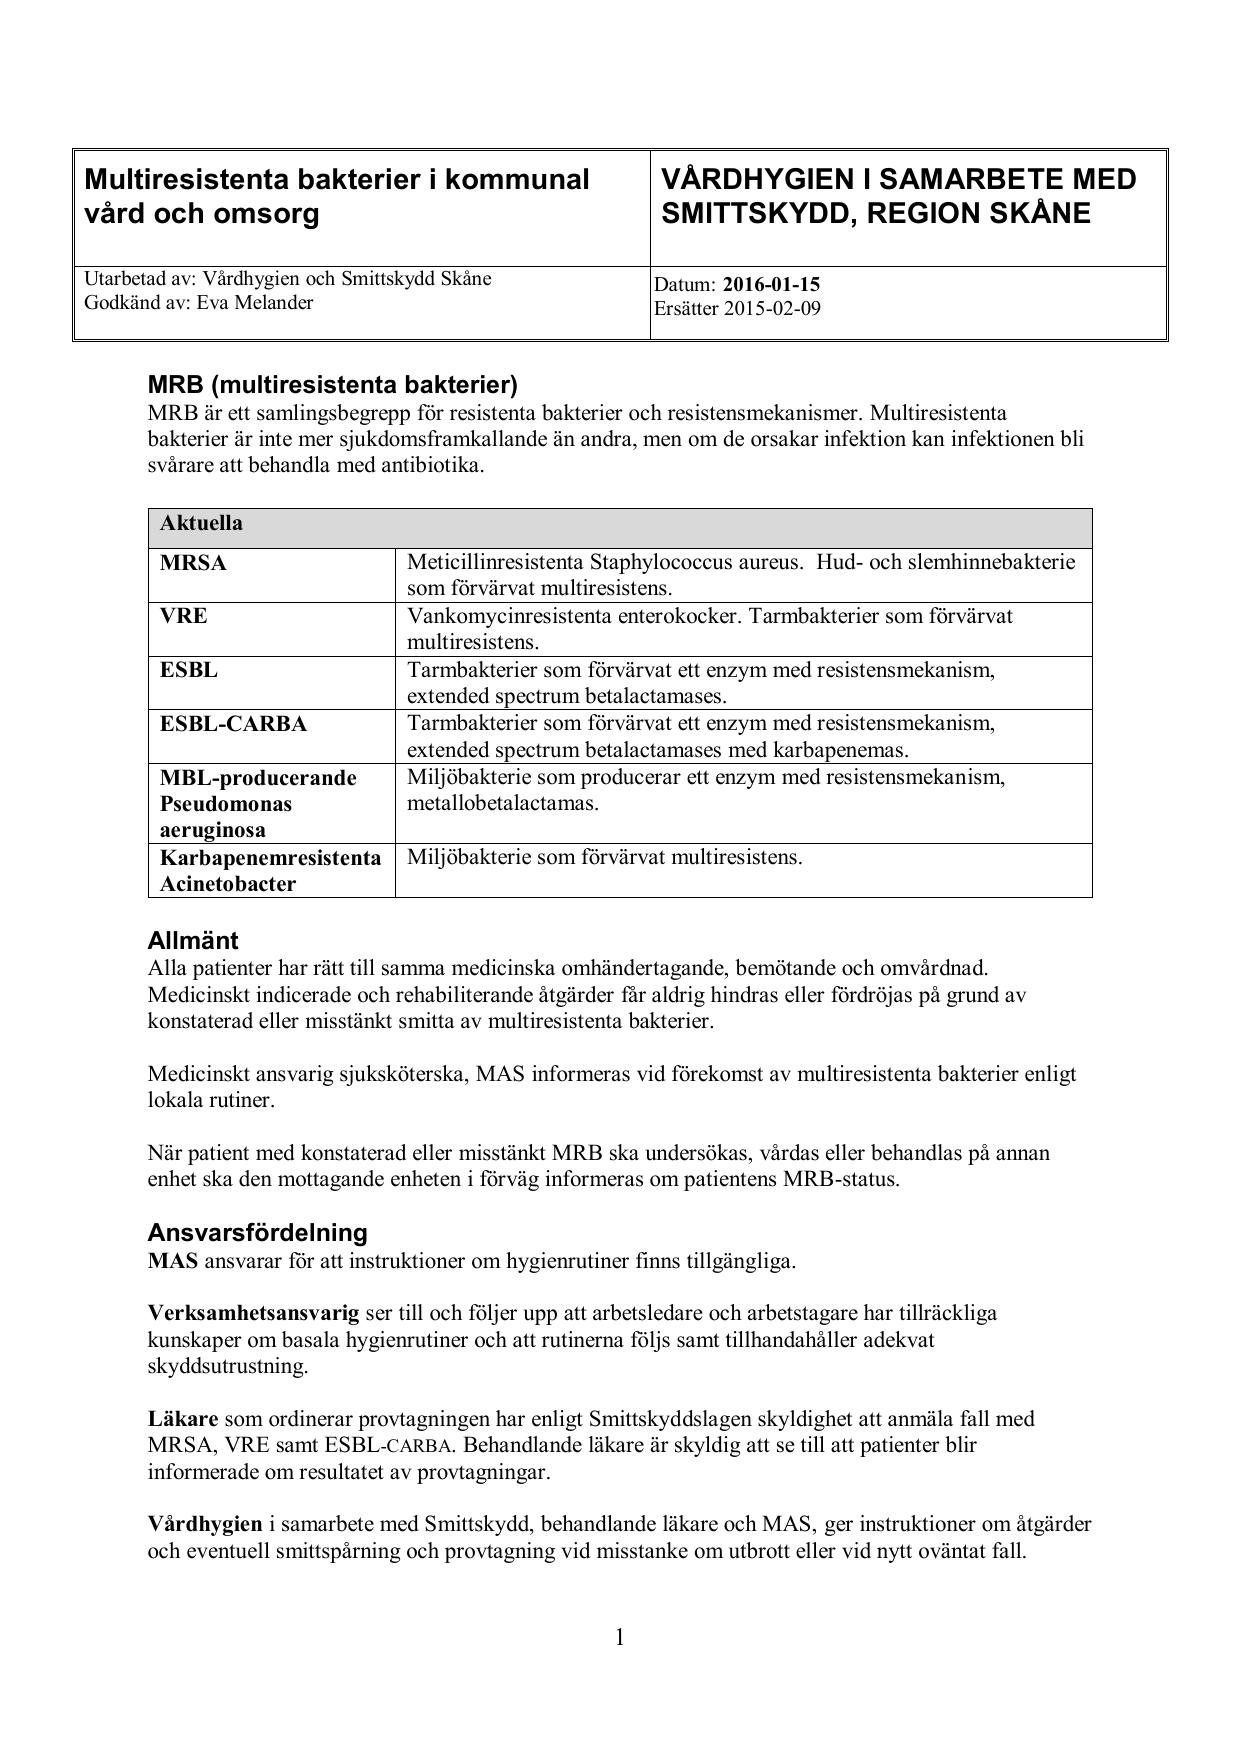 multiresistenta bakterier smitta